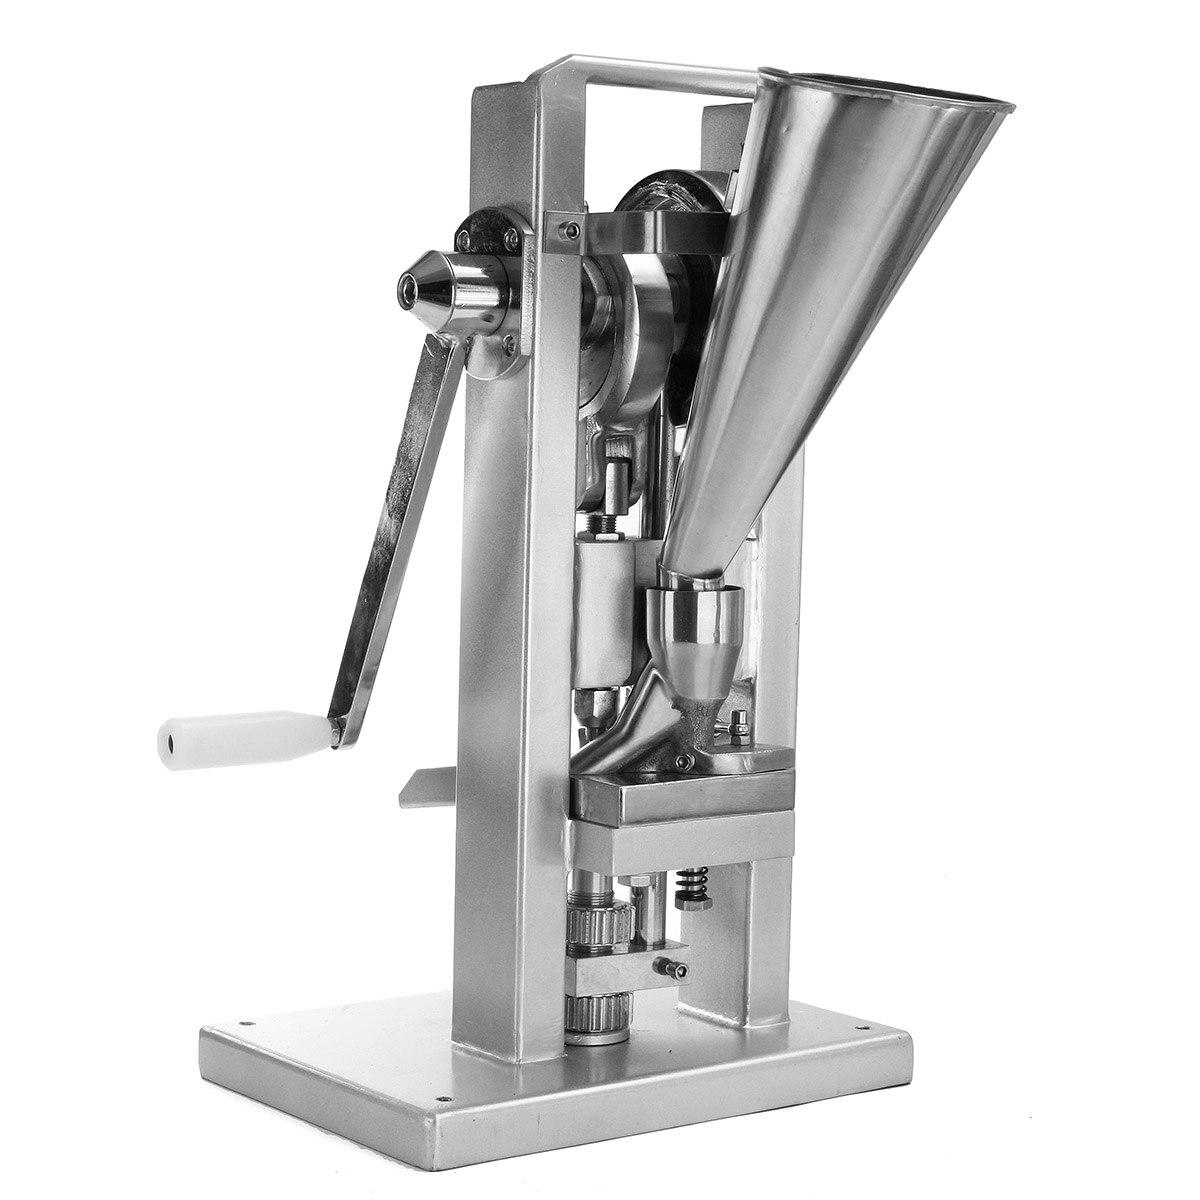 Máquina Manual de prensa de píldora simple/Fabricación de píldoras/(tipo más ligero) TDP-0/operado a mano/mini tipo 20KG